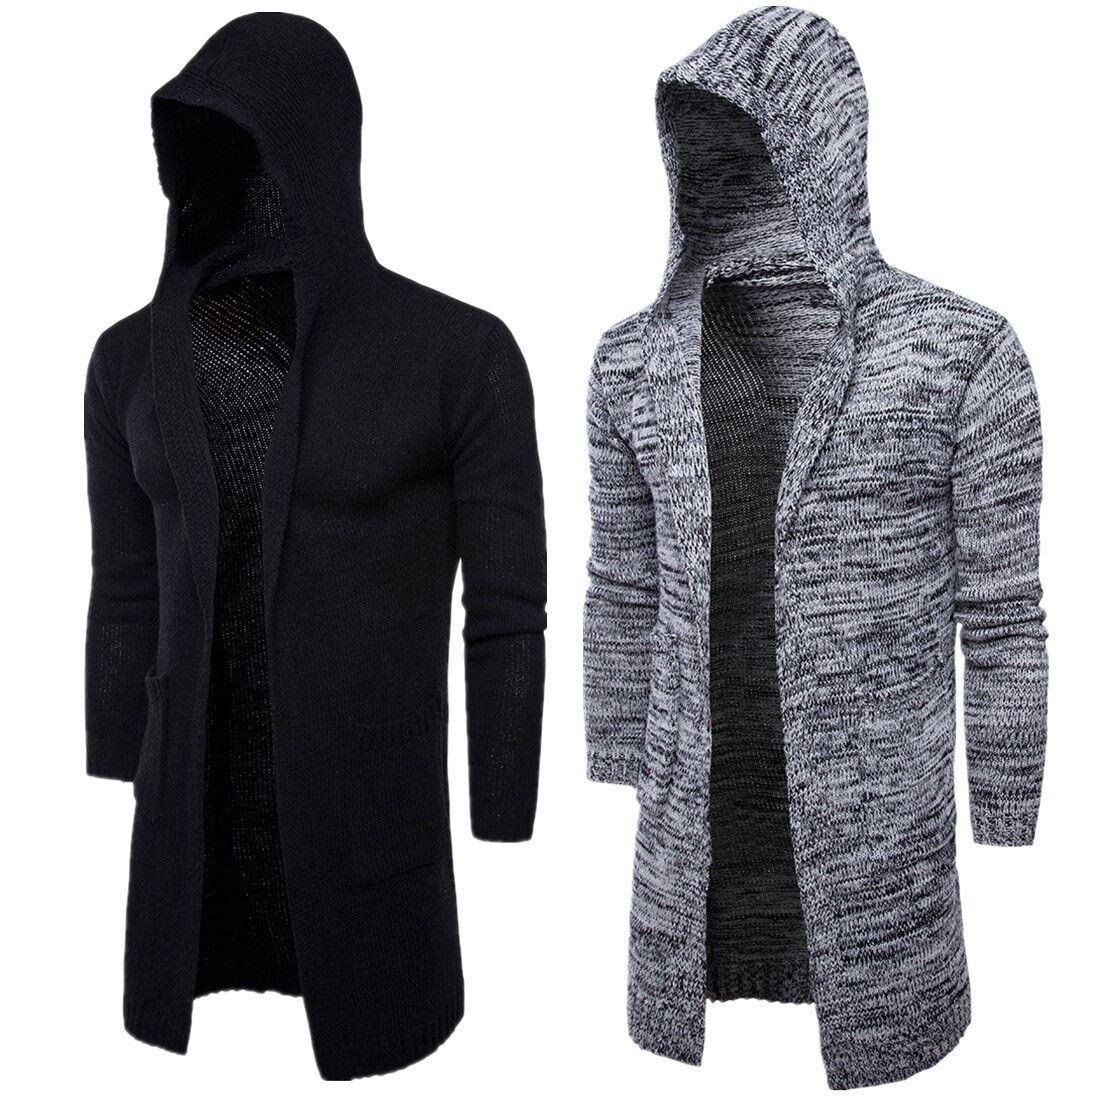 New Trend Thick Men's Windbreaker Long Hooded Sweater Cardigan ...